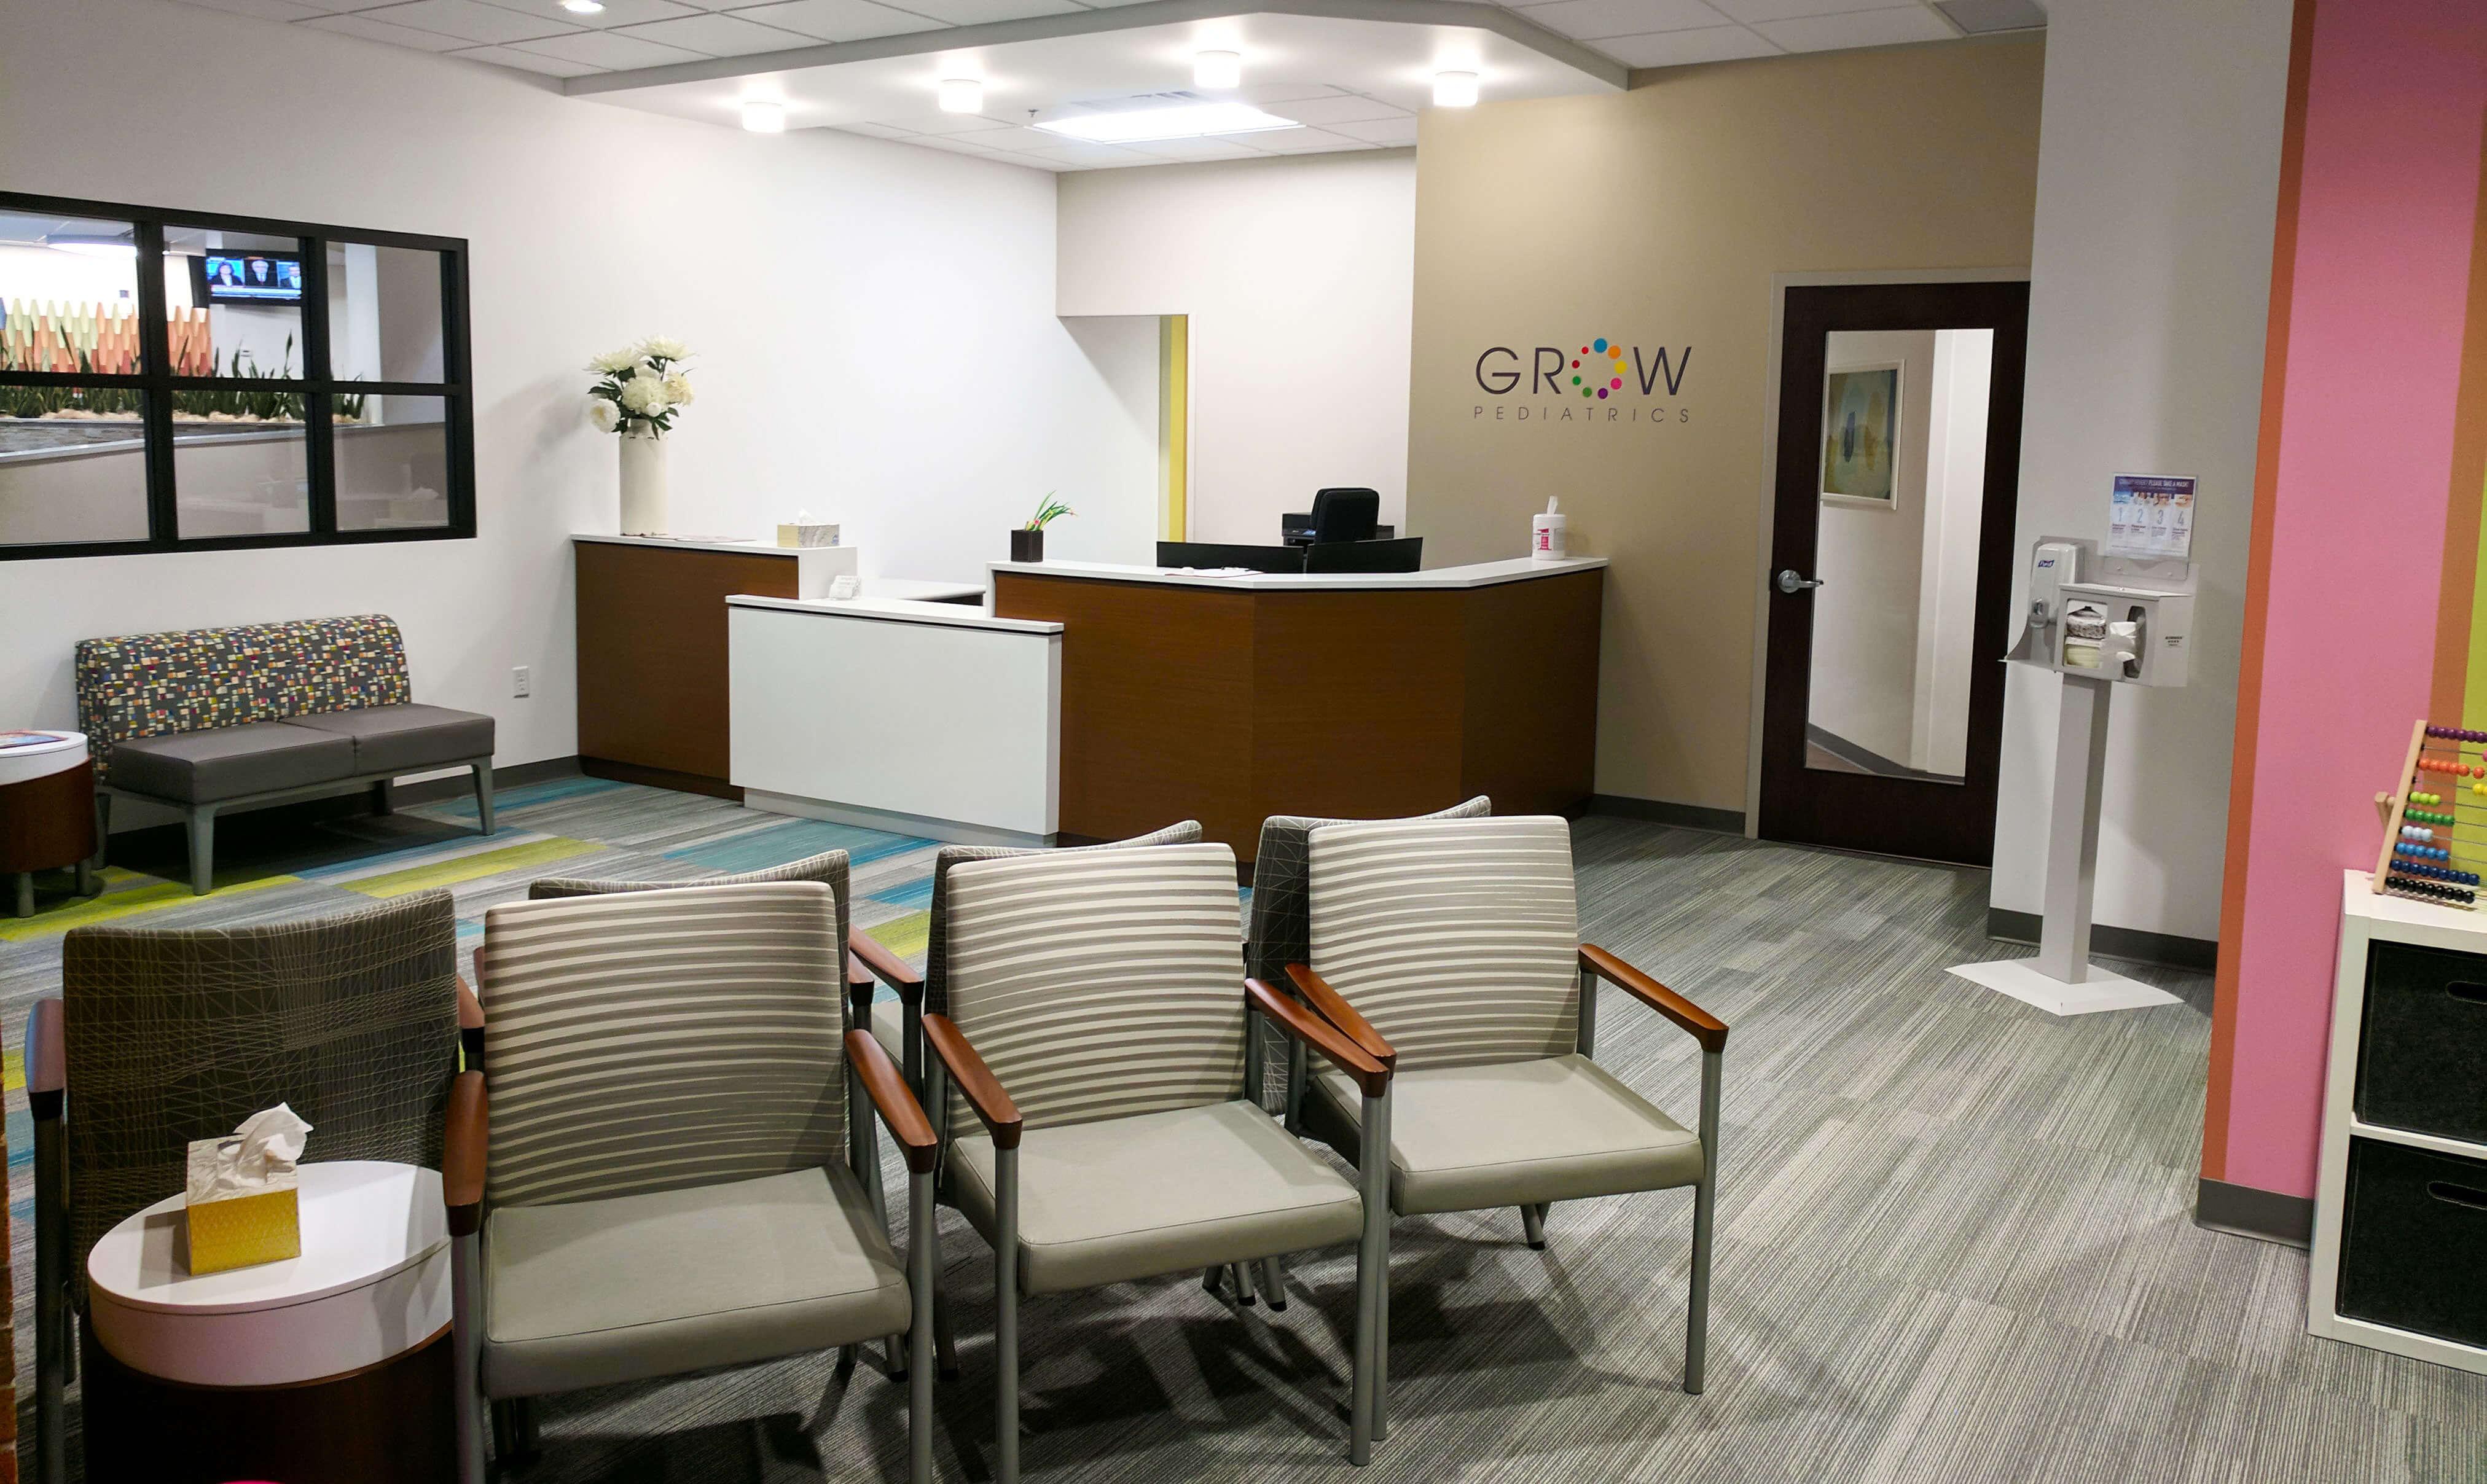 Grow pediatrics office design